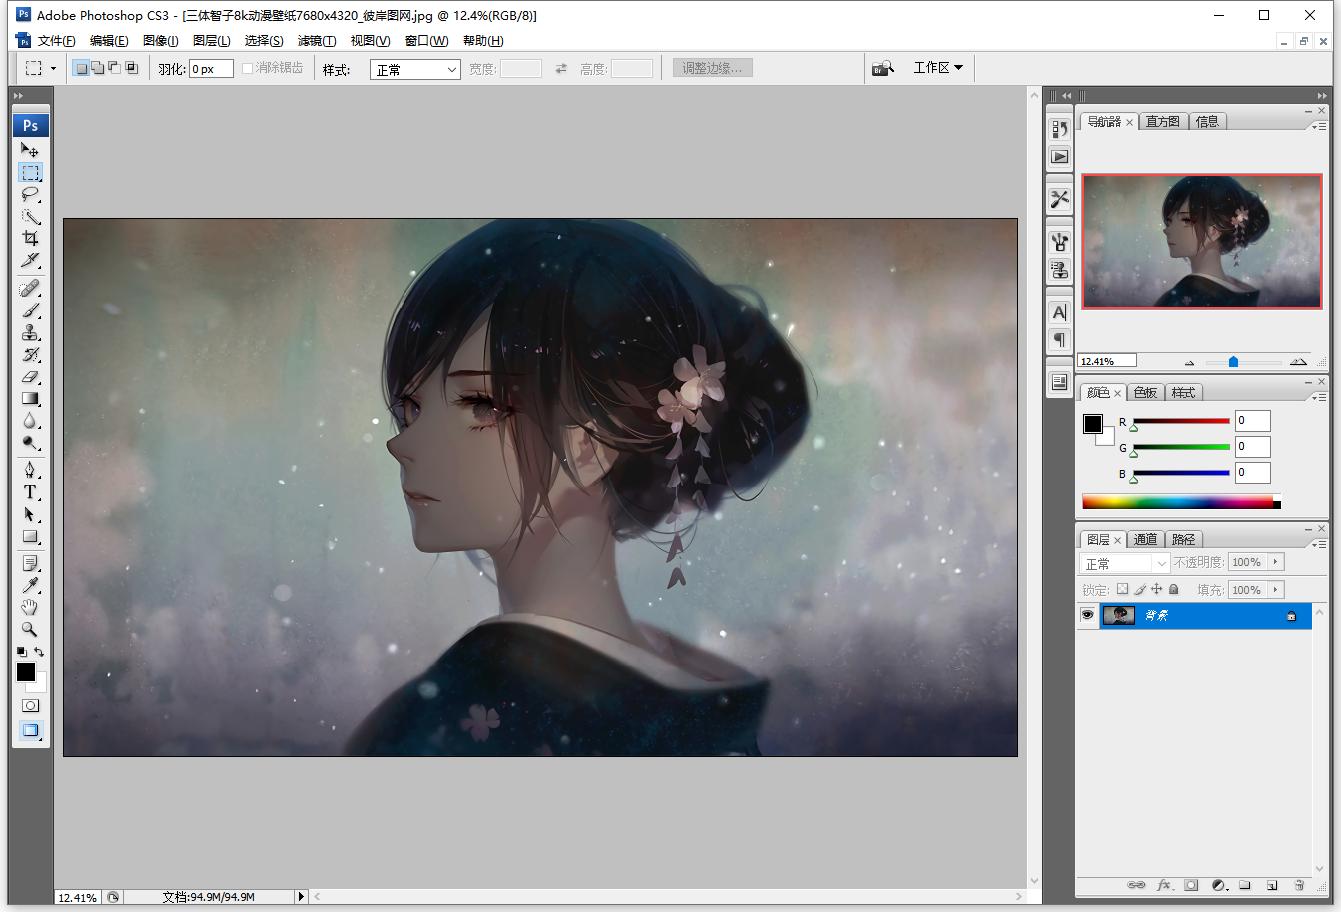 Adobe PhotoshopCS3 v10.0 精简已激活免安装